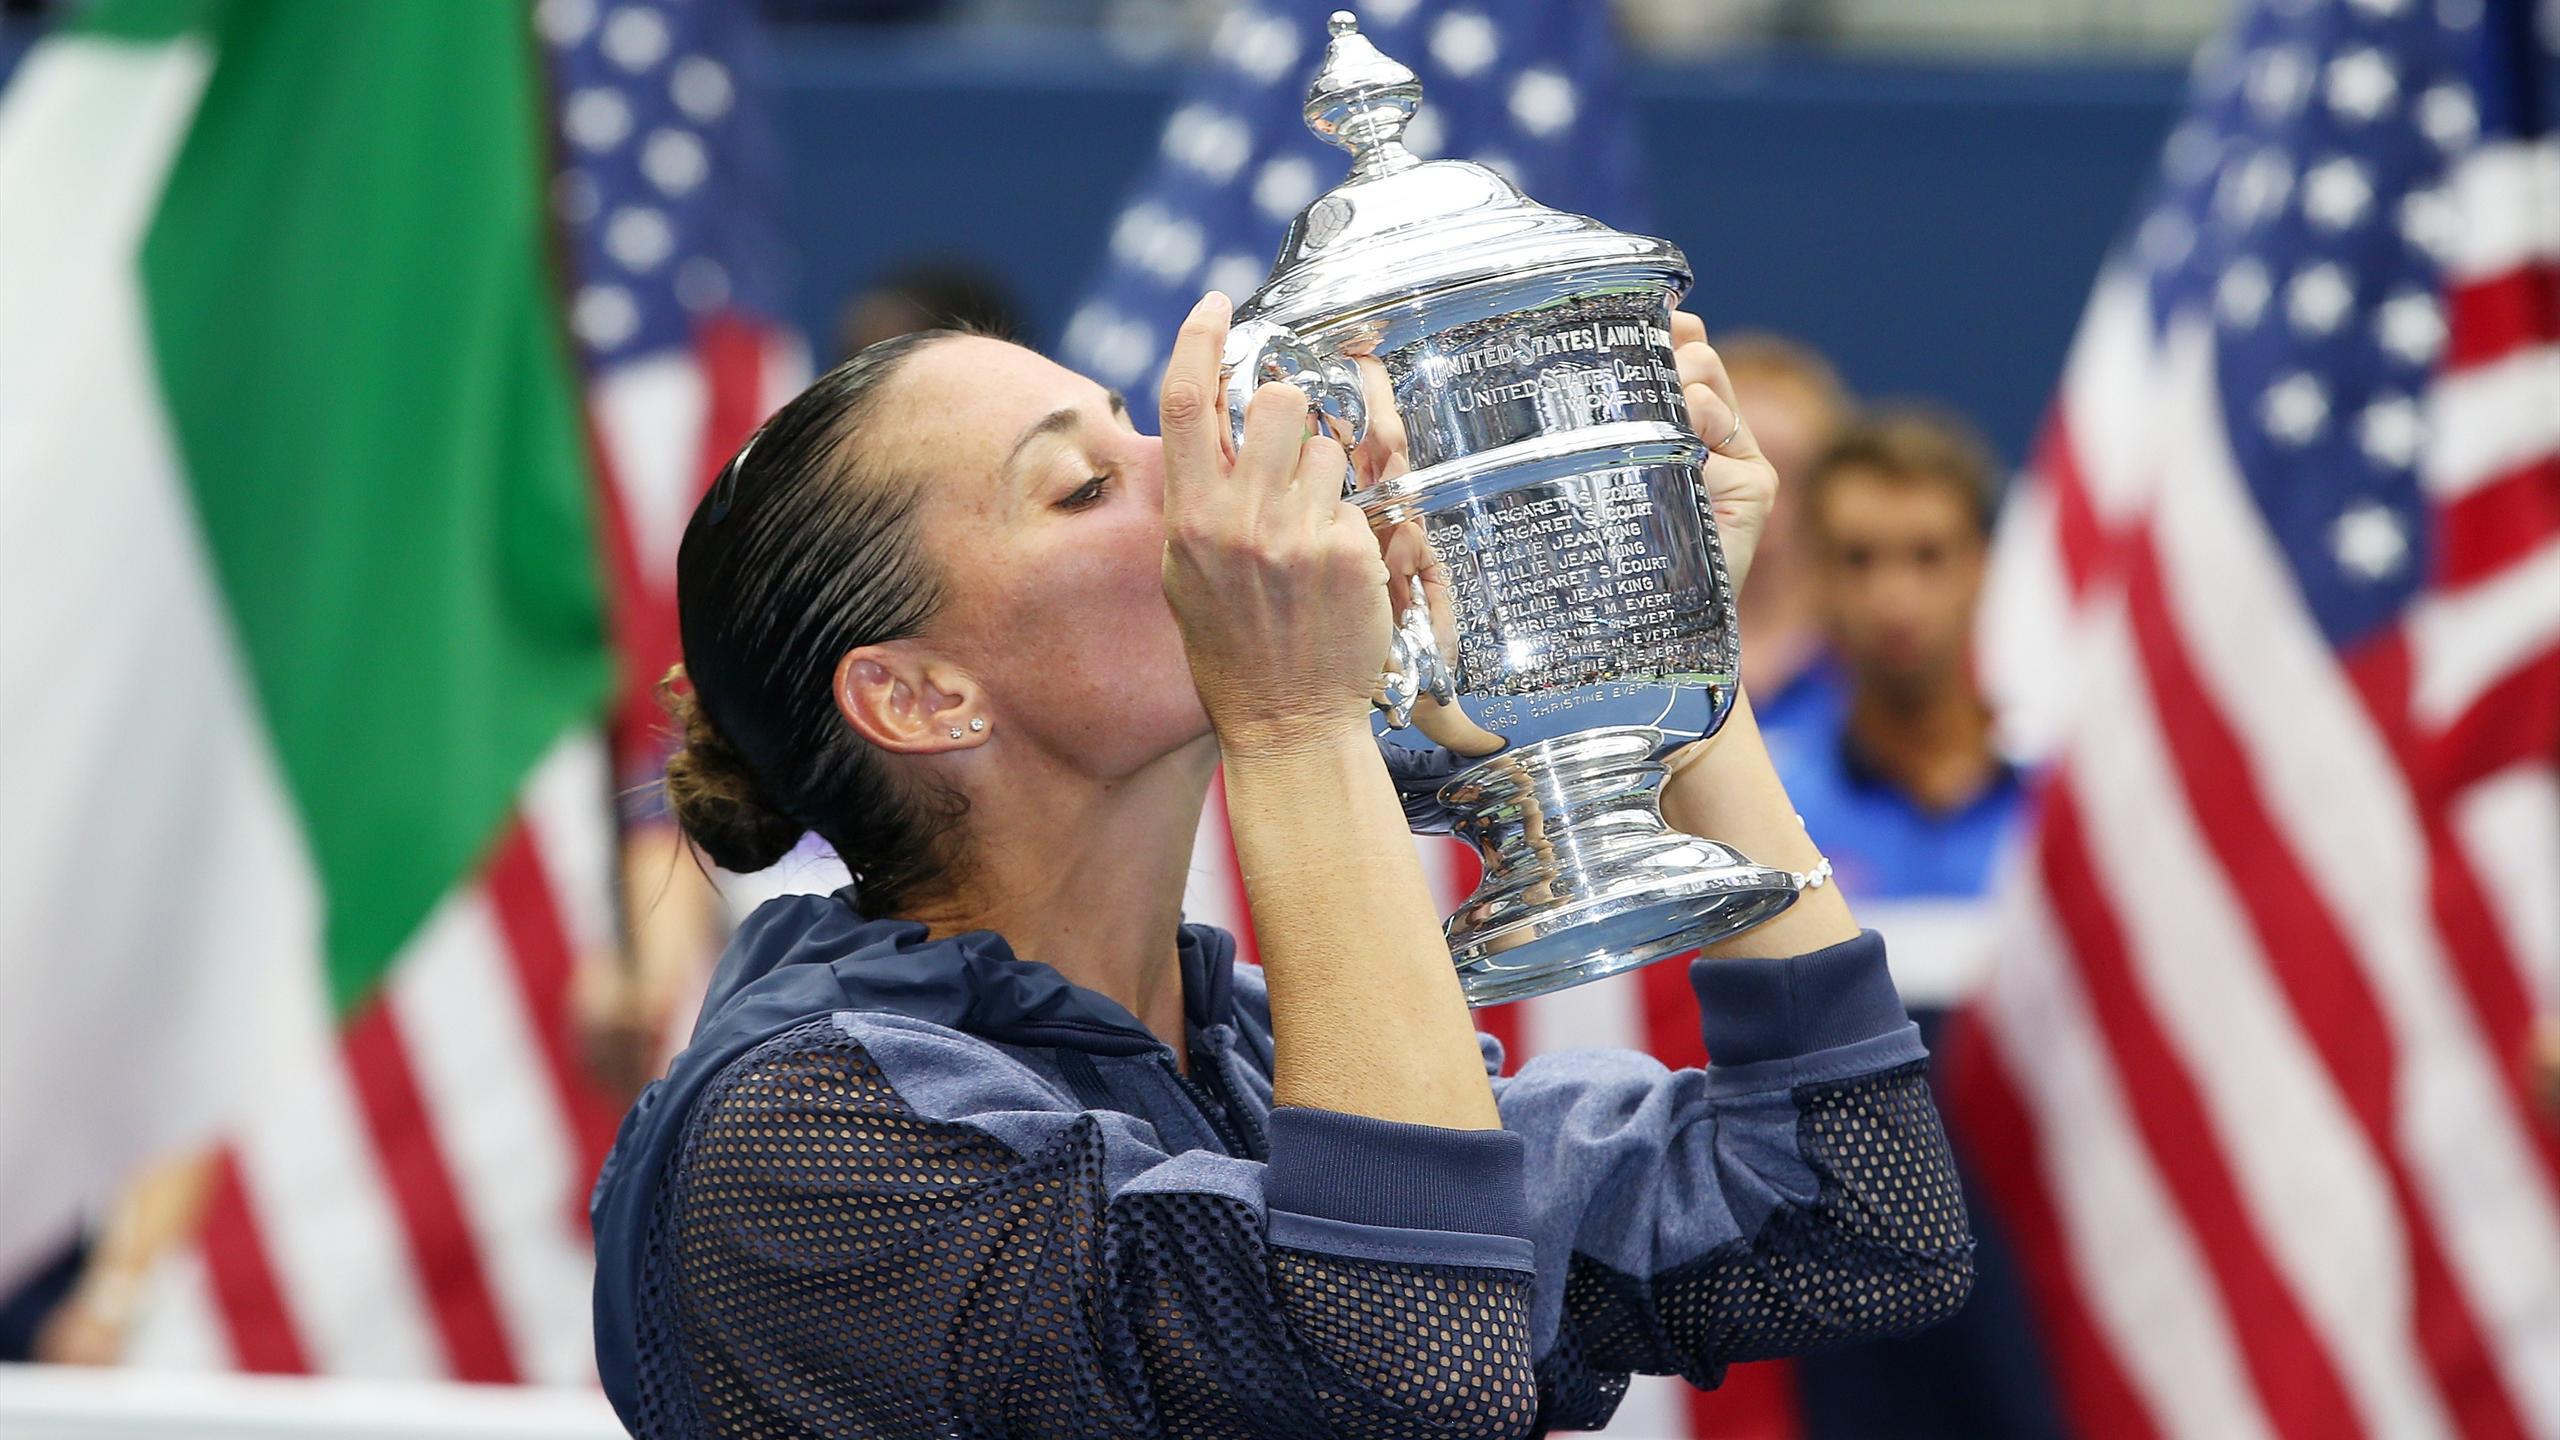 Flavia Pennetta US Open champion 2015